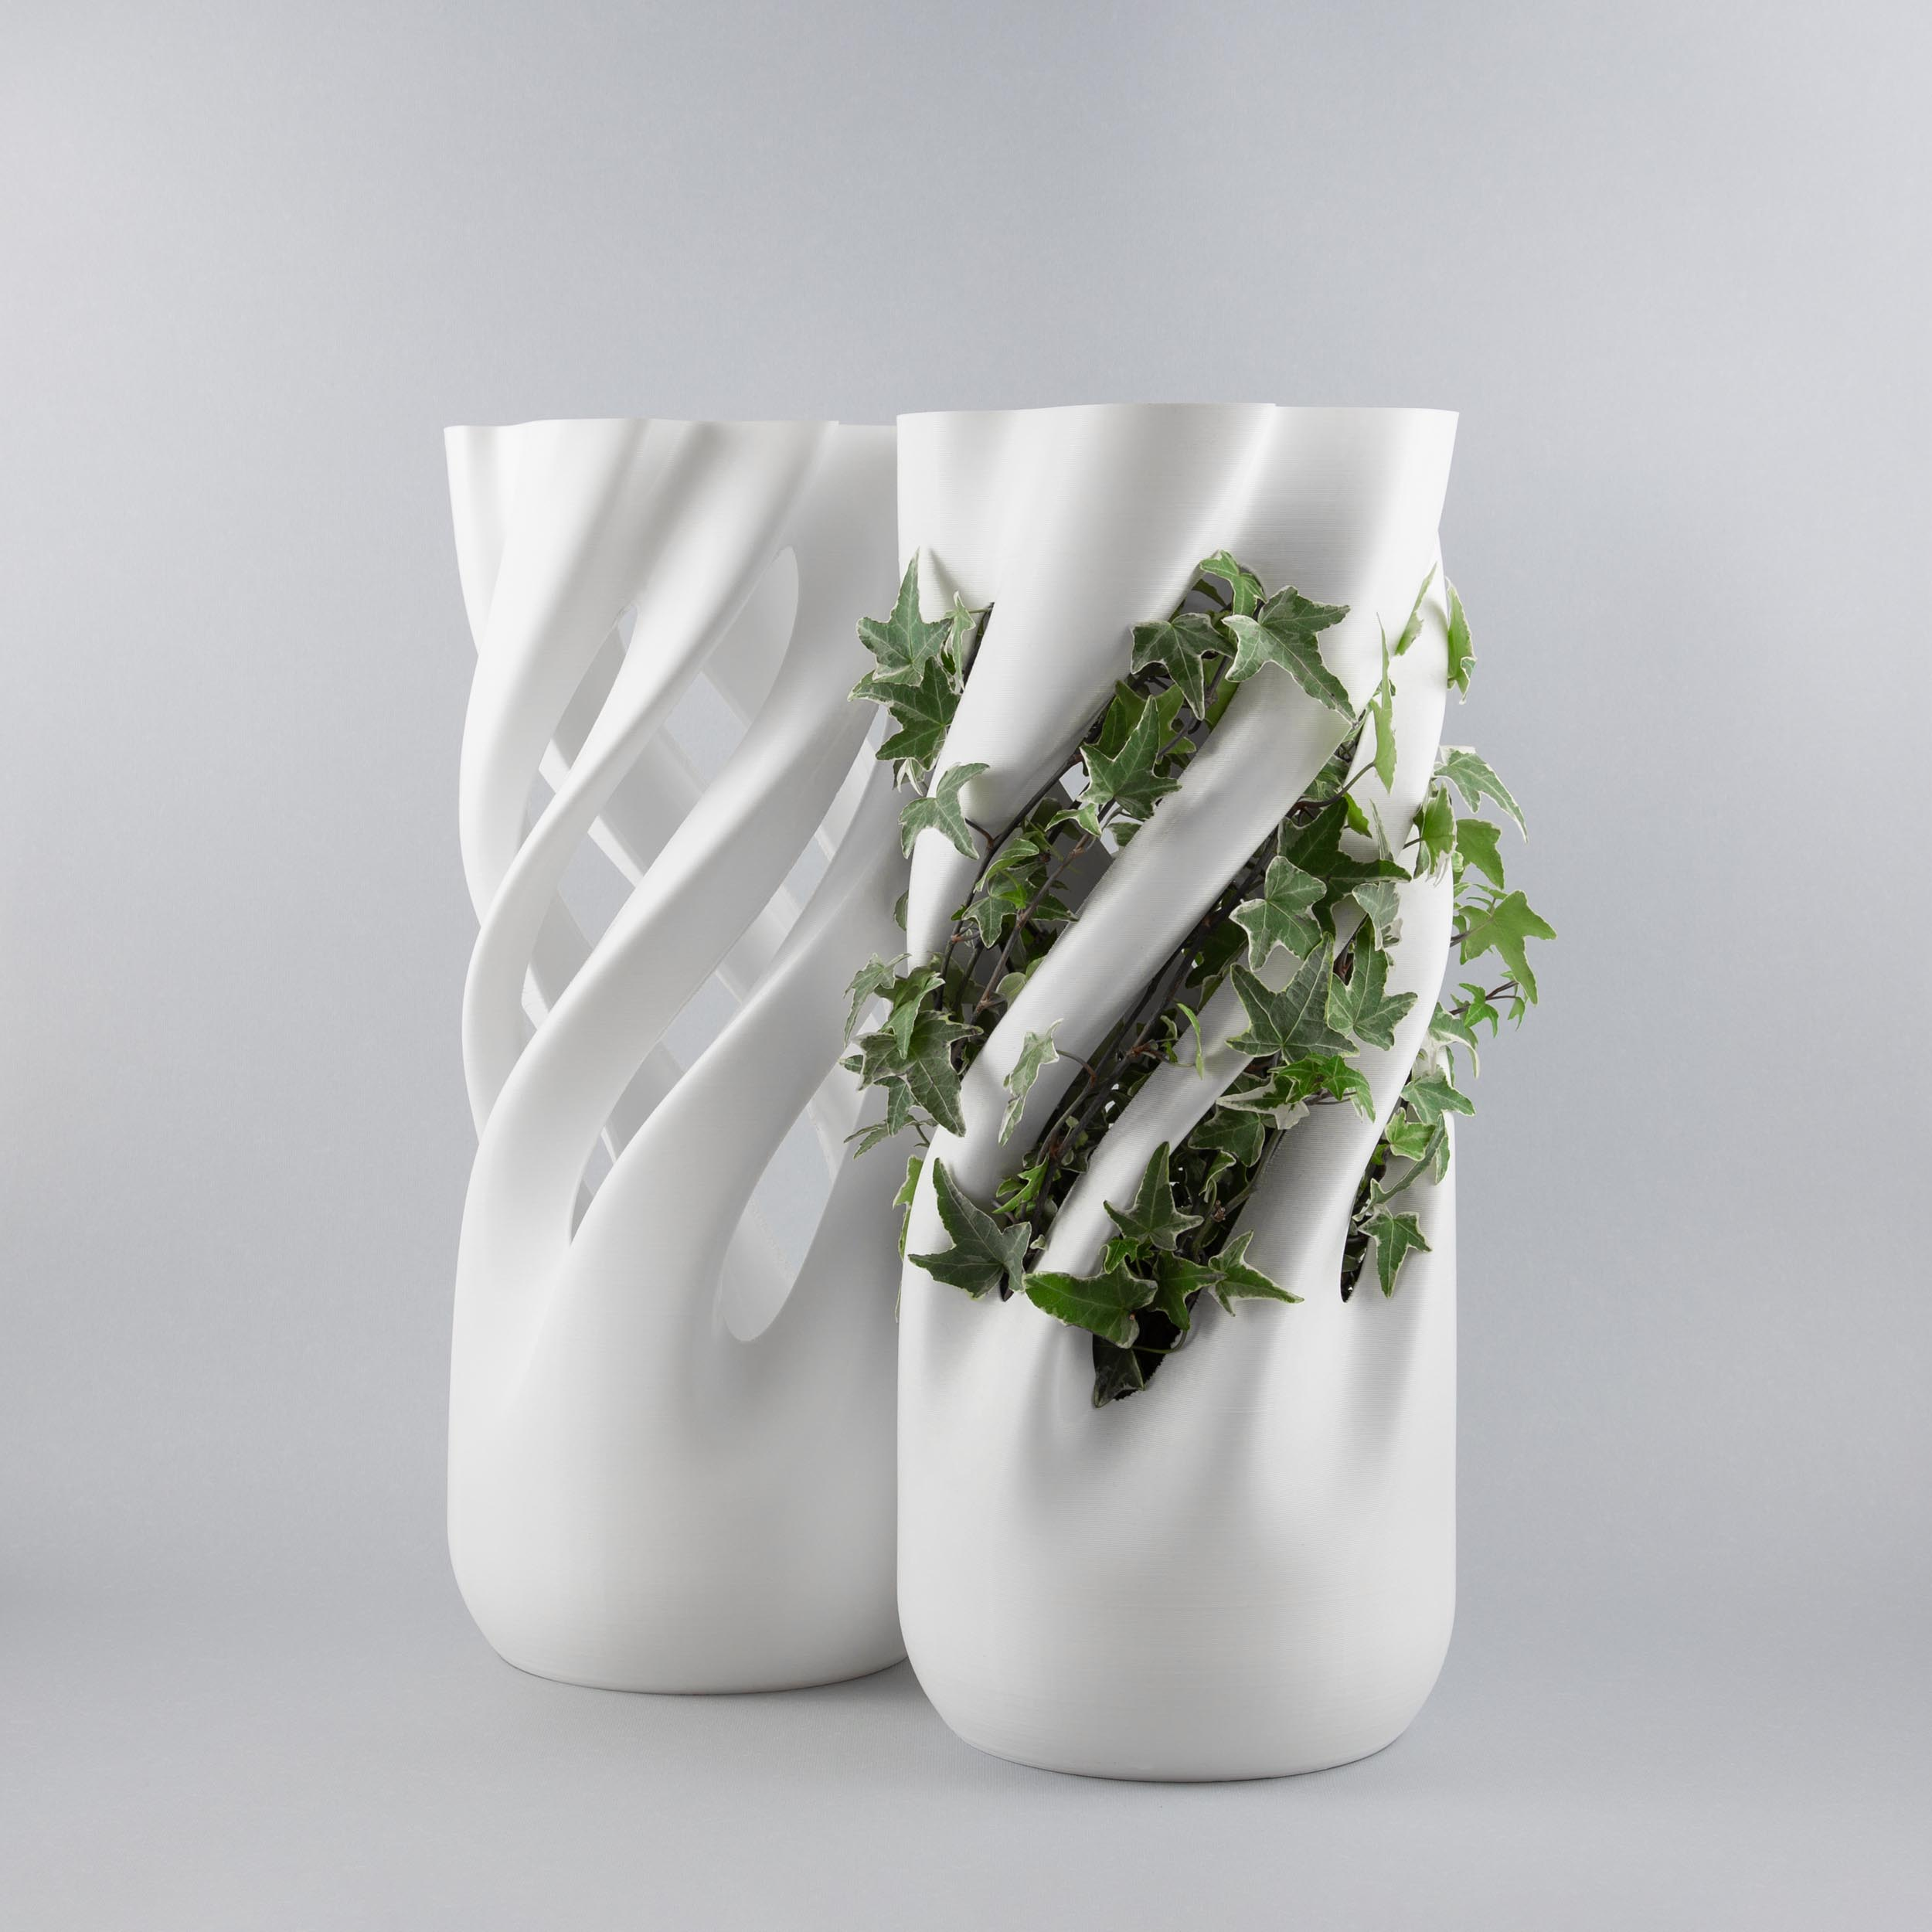 Abbracciame 3D printed vases